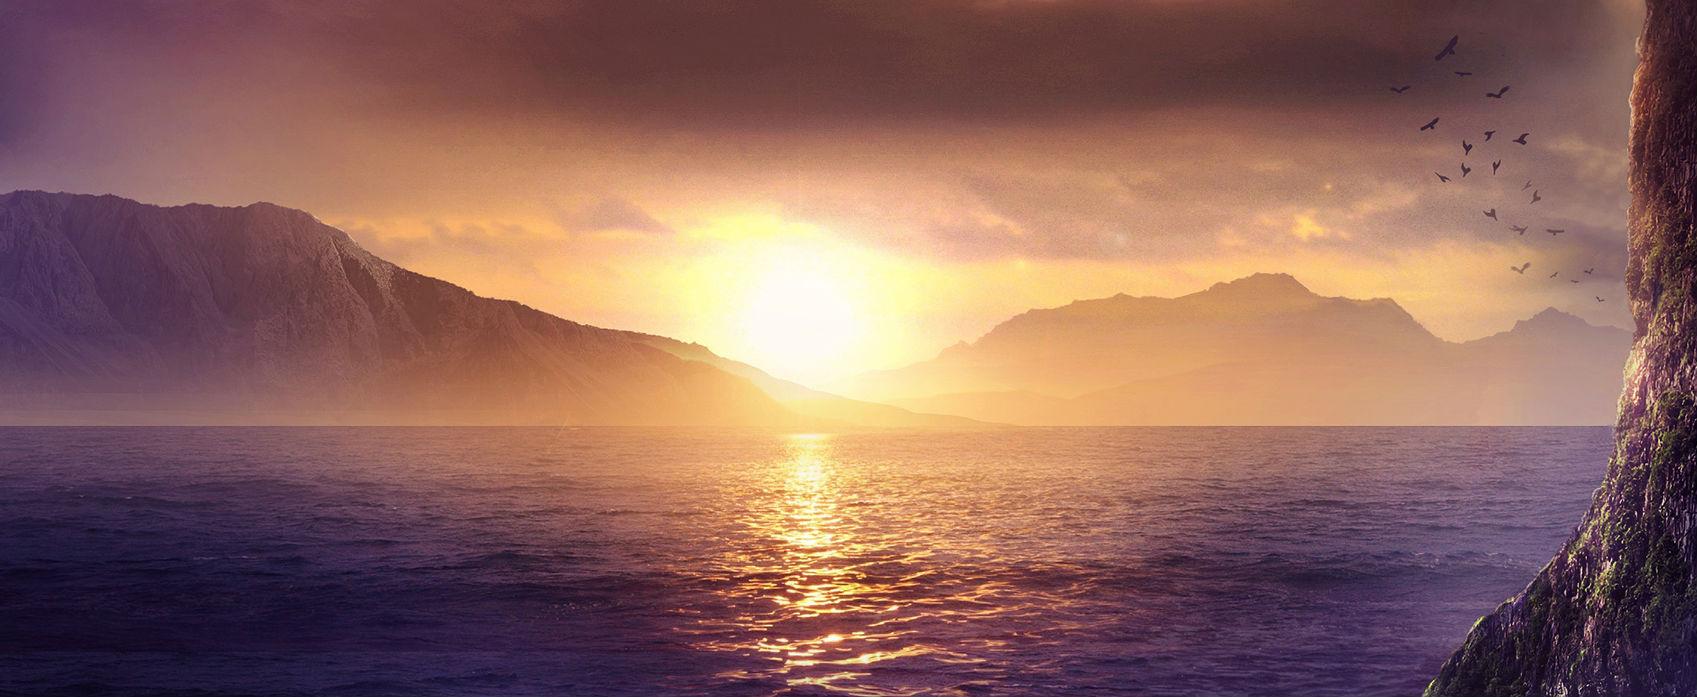 Fantasy ocean sunset